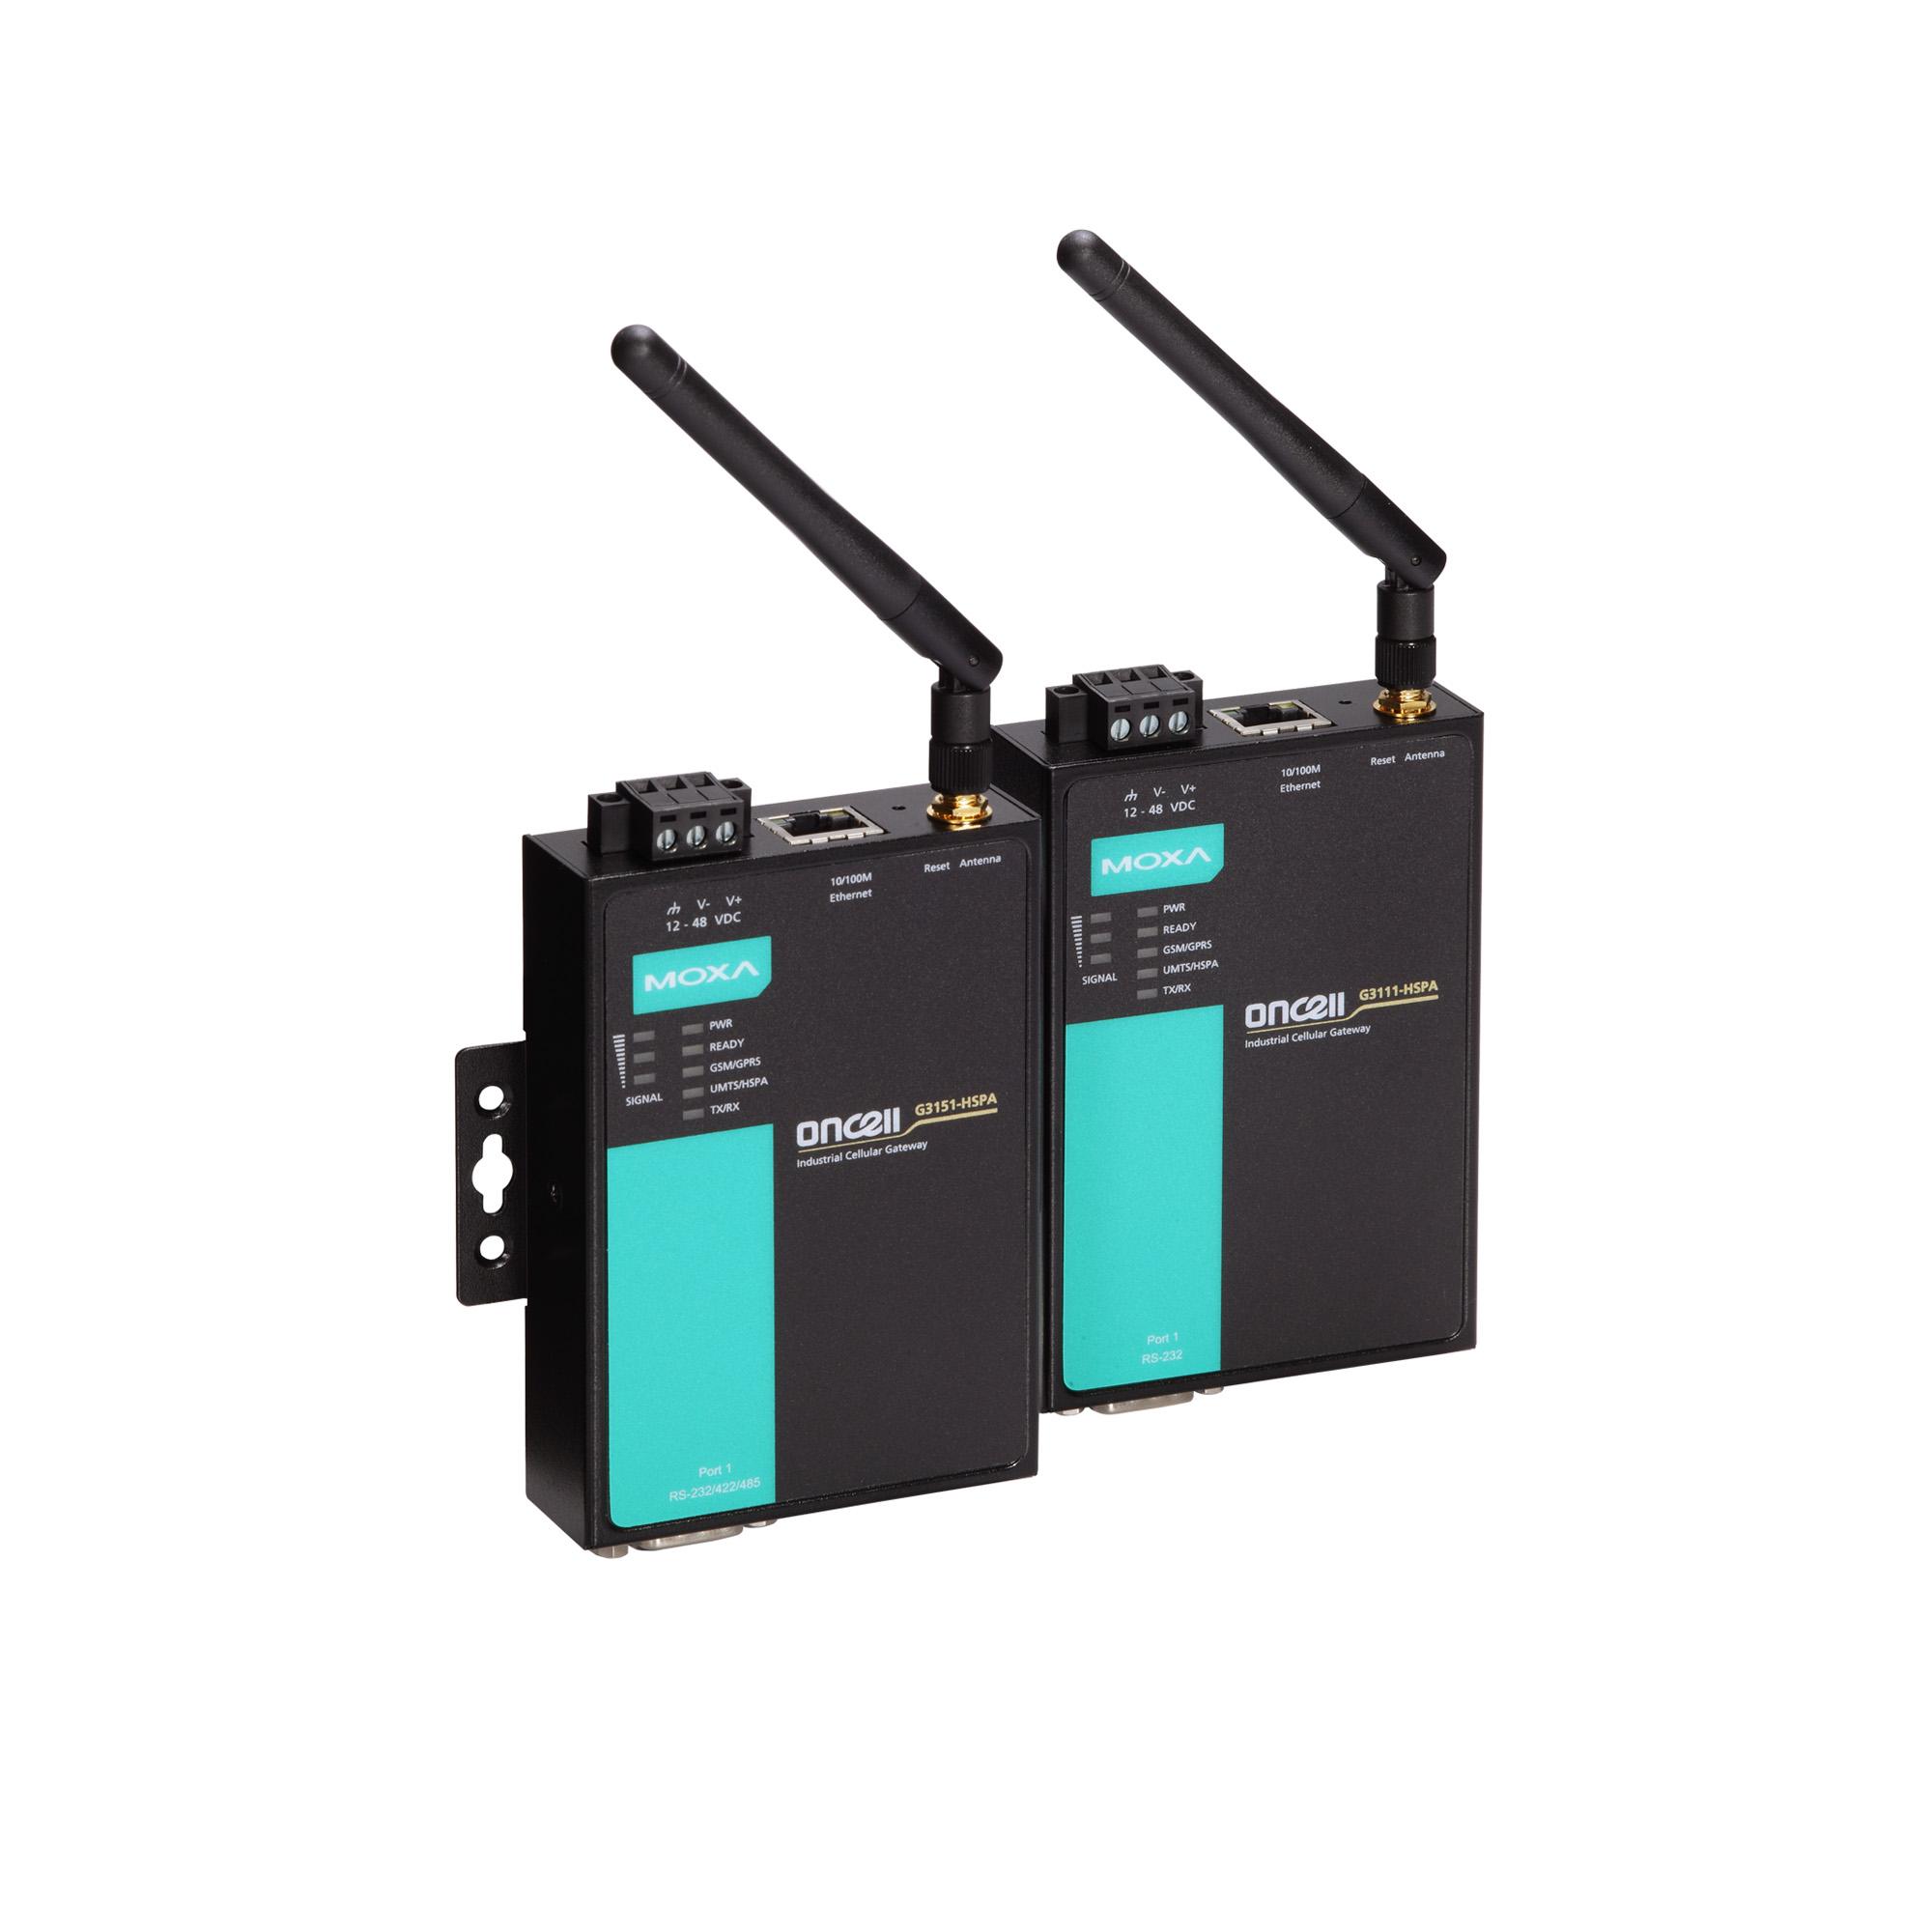 OnCell G3101-HSPA Series - Cellular Gateways   MOXA